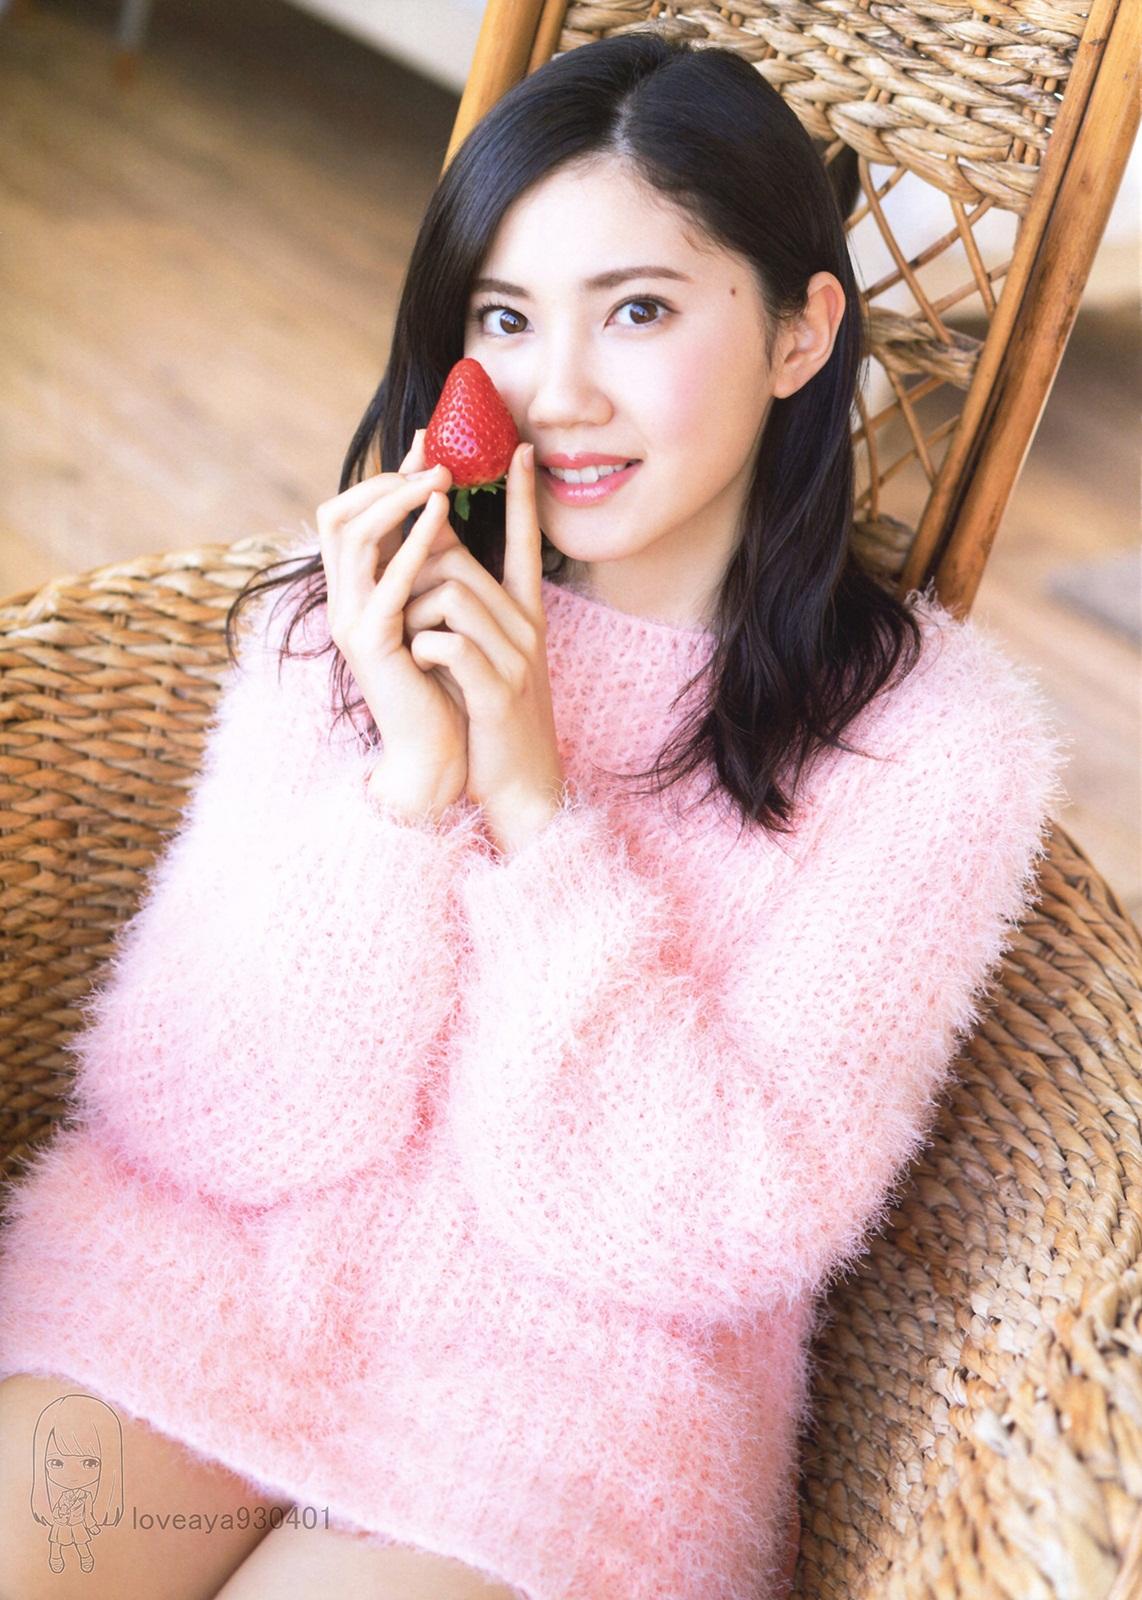 Kitagawa Ryoha 北川綾巴 SKE48, FLASH Special Gravure BEST 2017 GW (FLASHスペシャルグラビアBEST 2017 GW号)